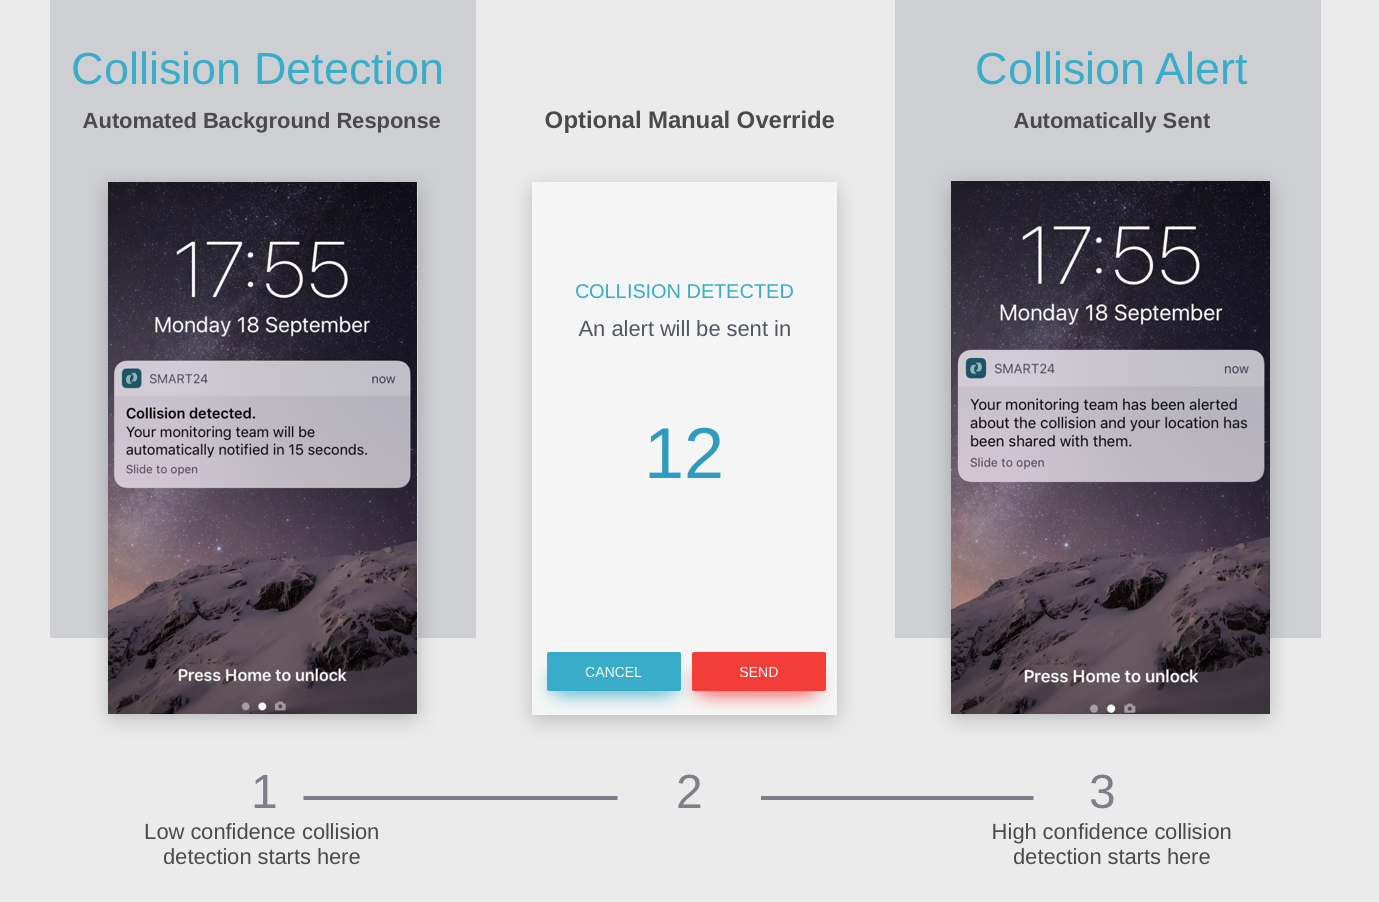 Introducing Smart24 Collision Response